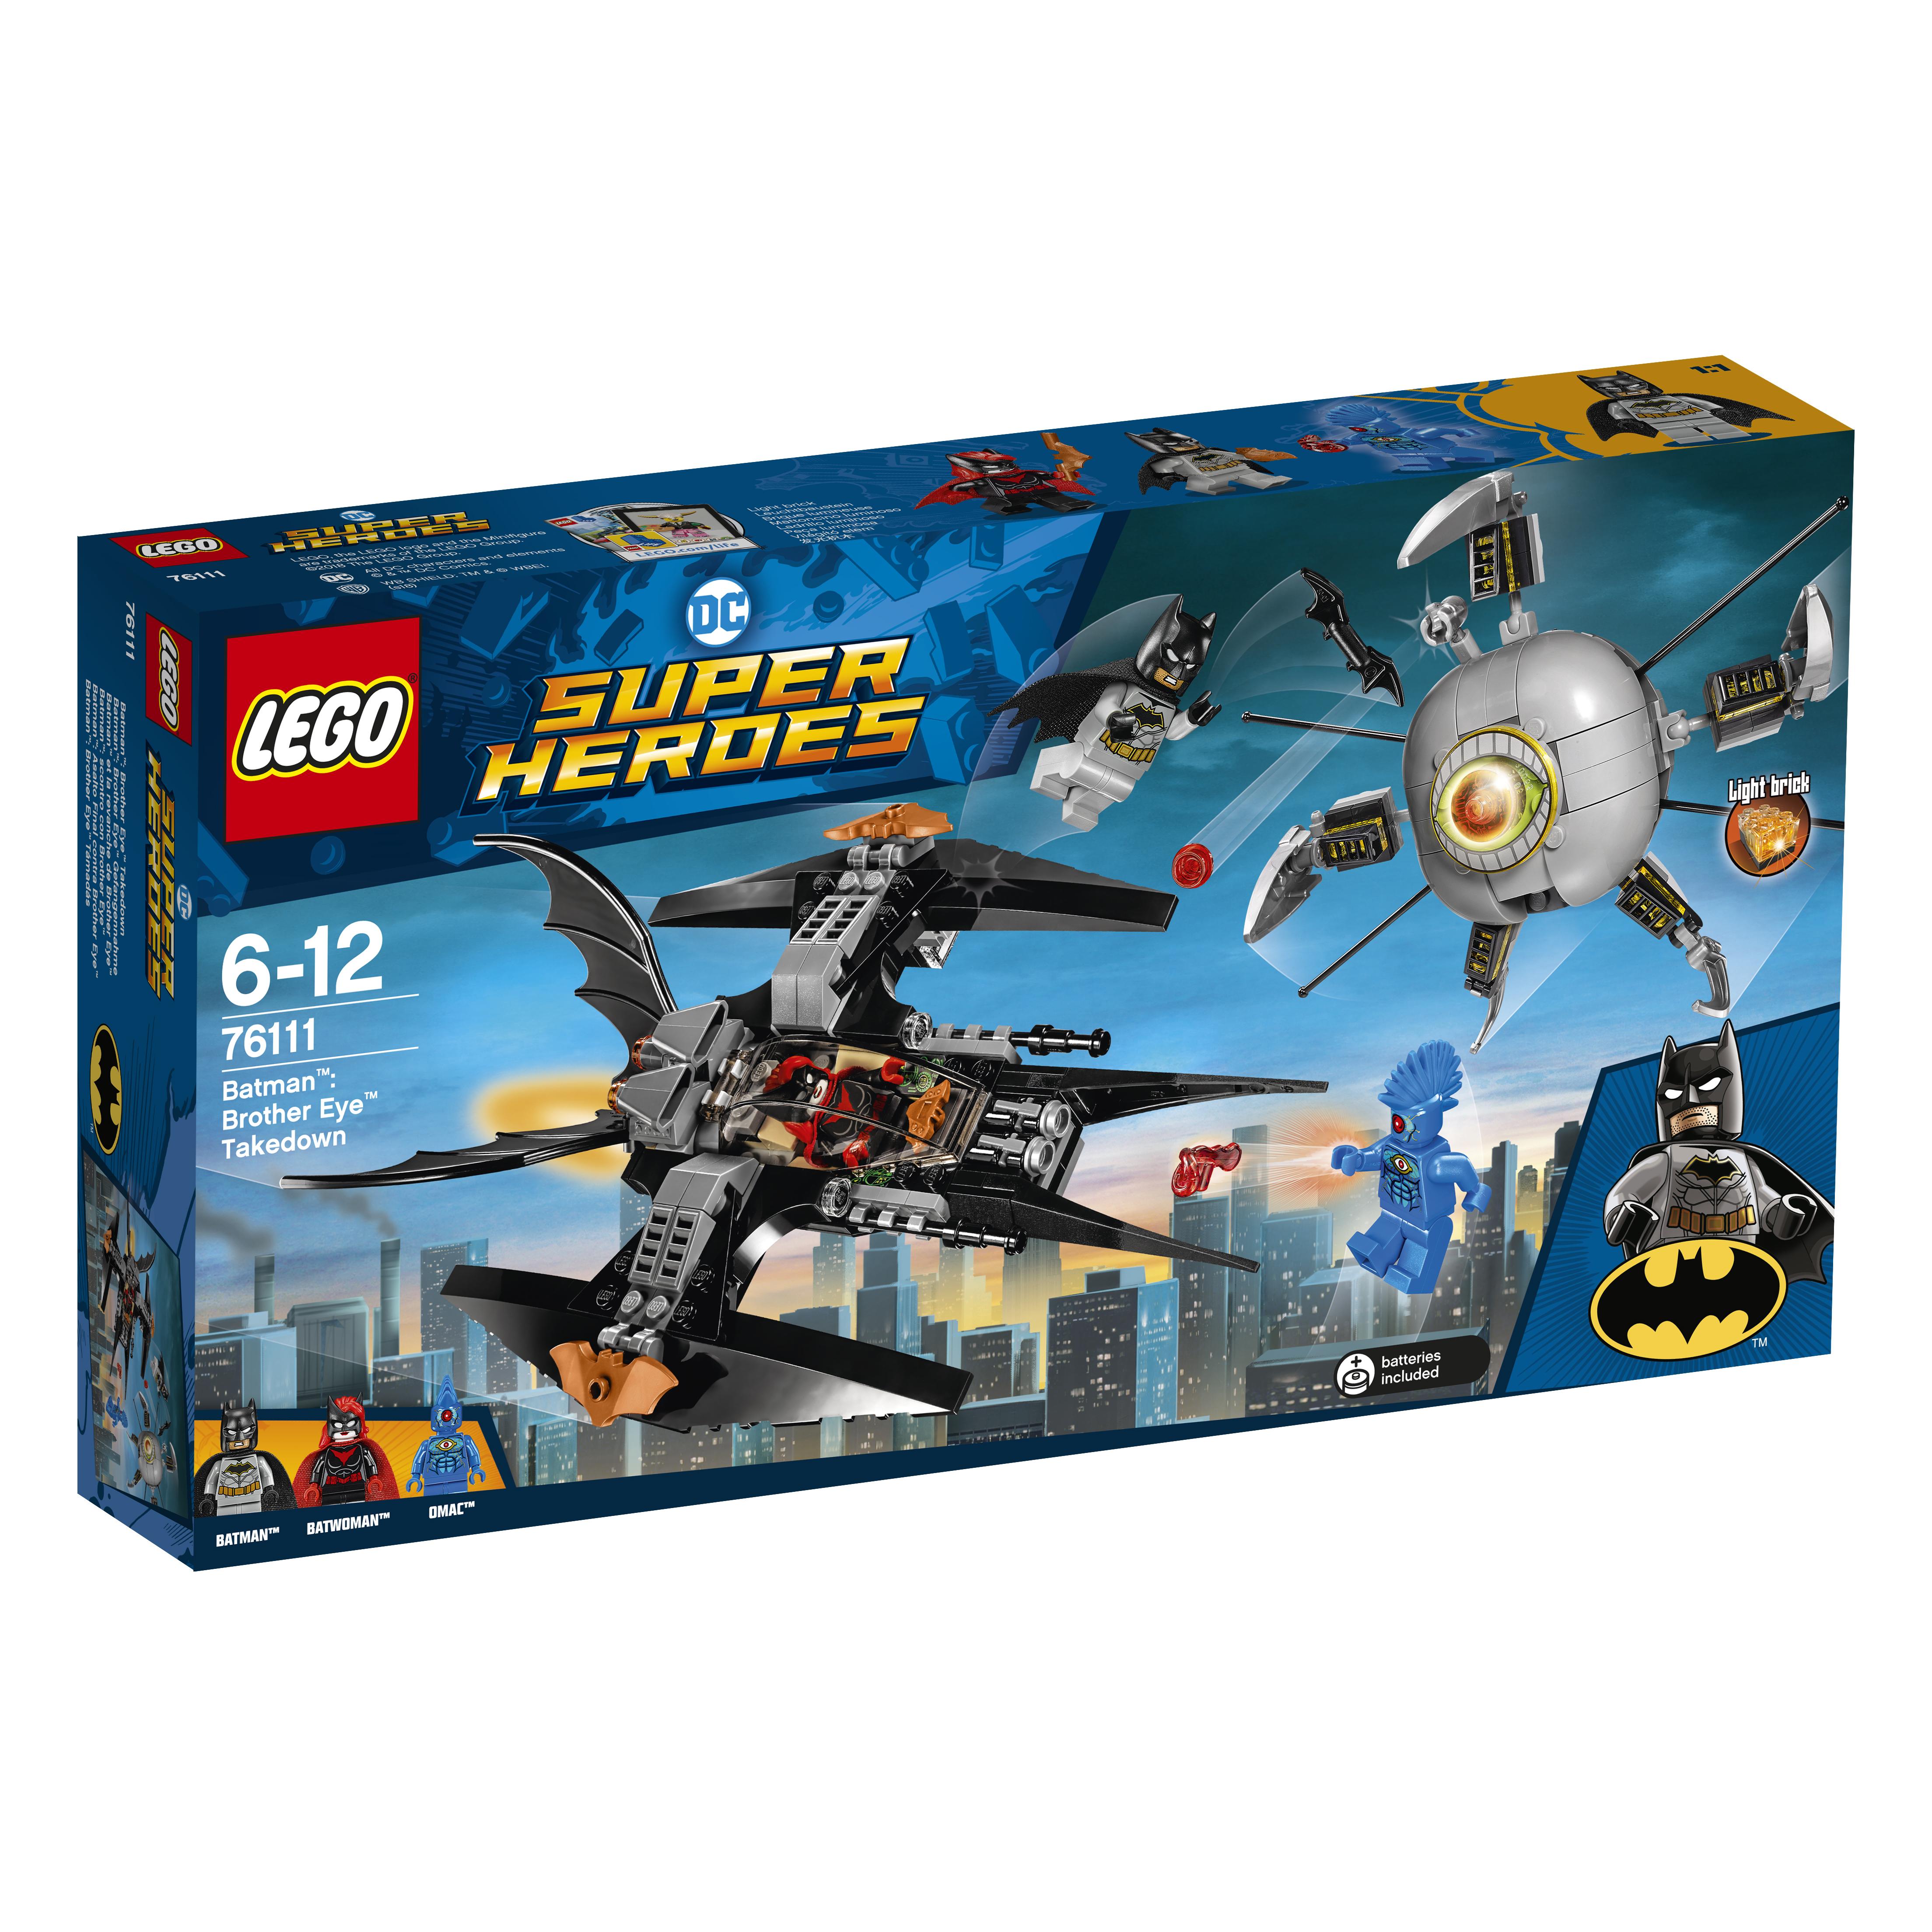 LEGO LEGO Конструктор LEGO Super Heroes 76111 Бэтмен: ликвидация Глаза брата lego batman 2 dc super heroes [pc цифровая версия] цифровая версия